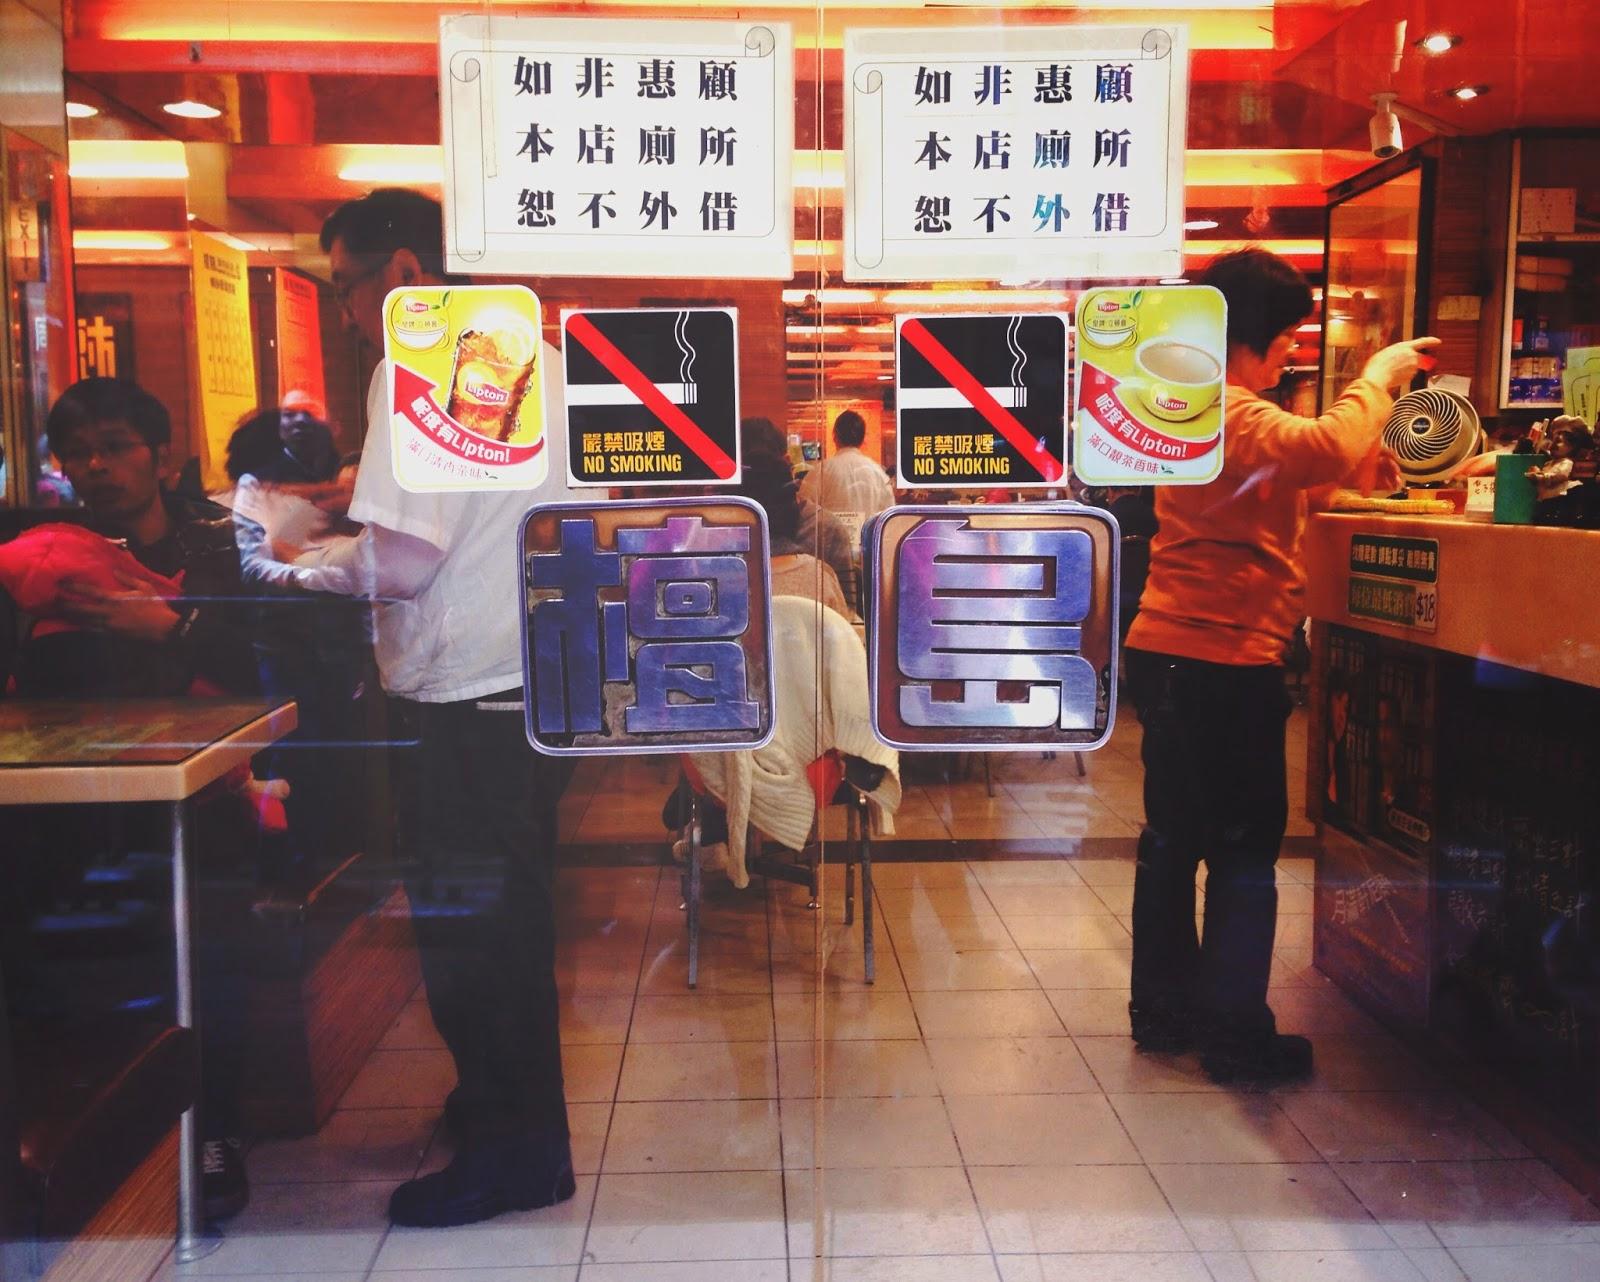 Honolulu Coffee Shop at Hennessey Road Wan Chai 檀島咖啡餅